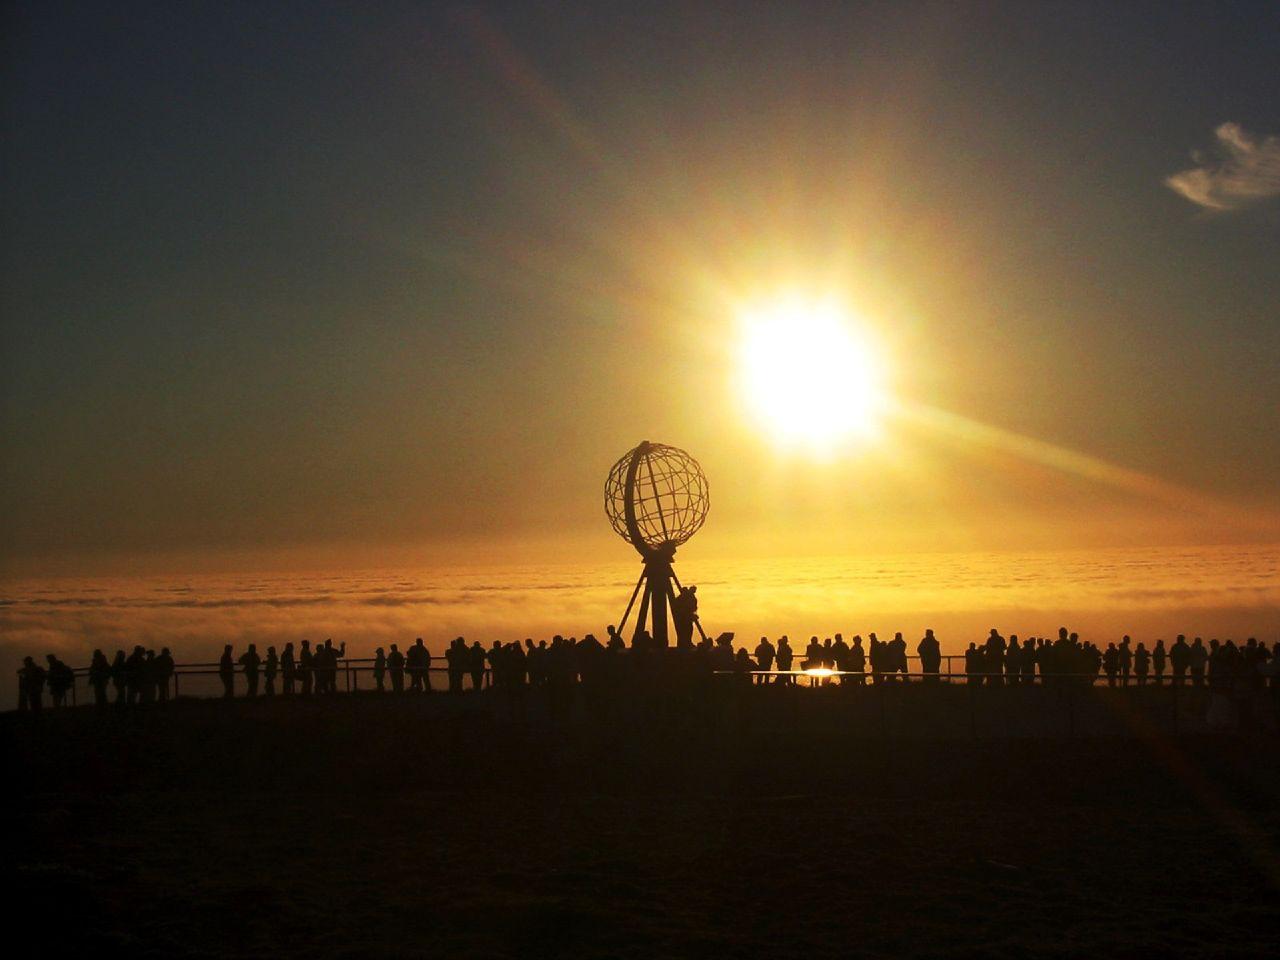 Matahari Tengah Malam Fenomena Alam Unik